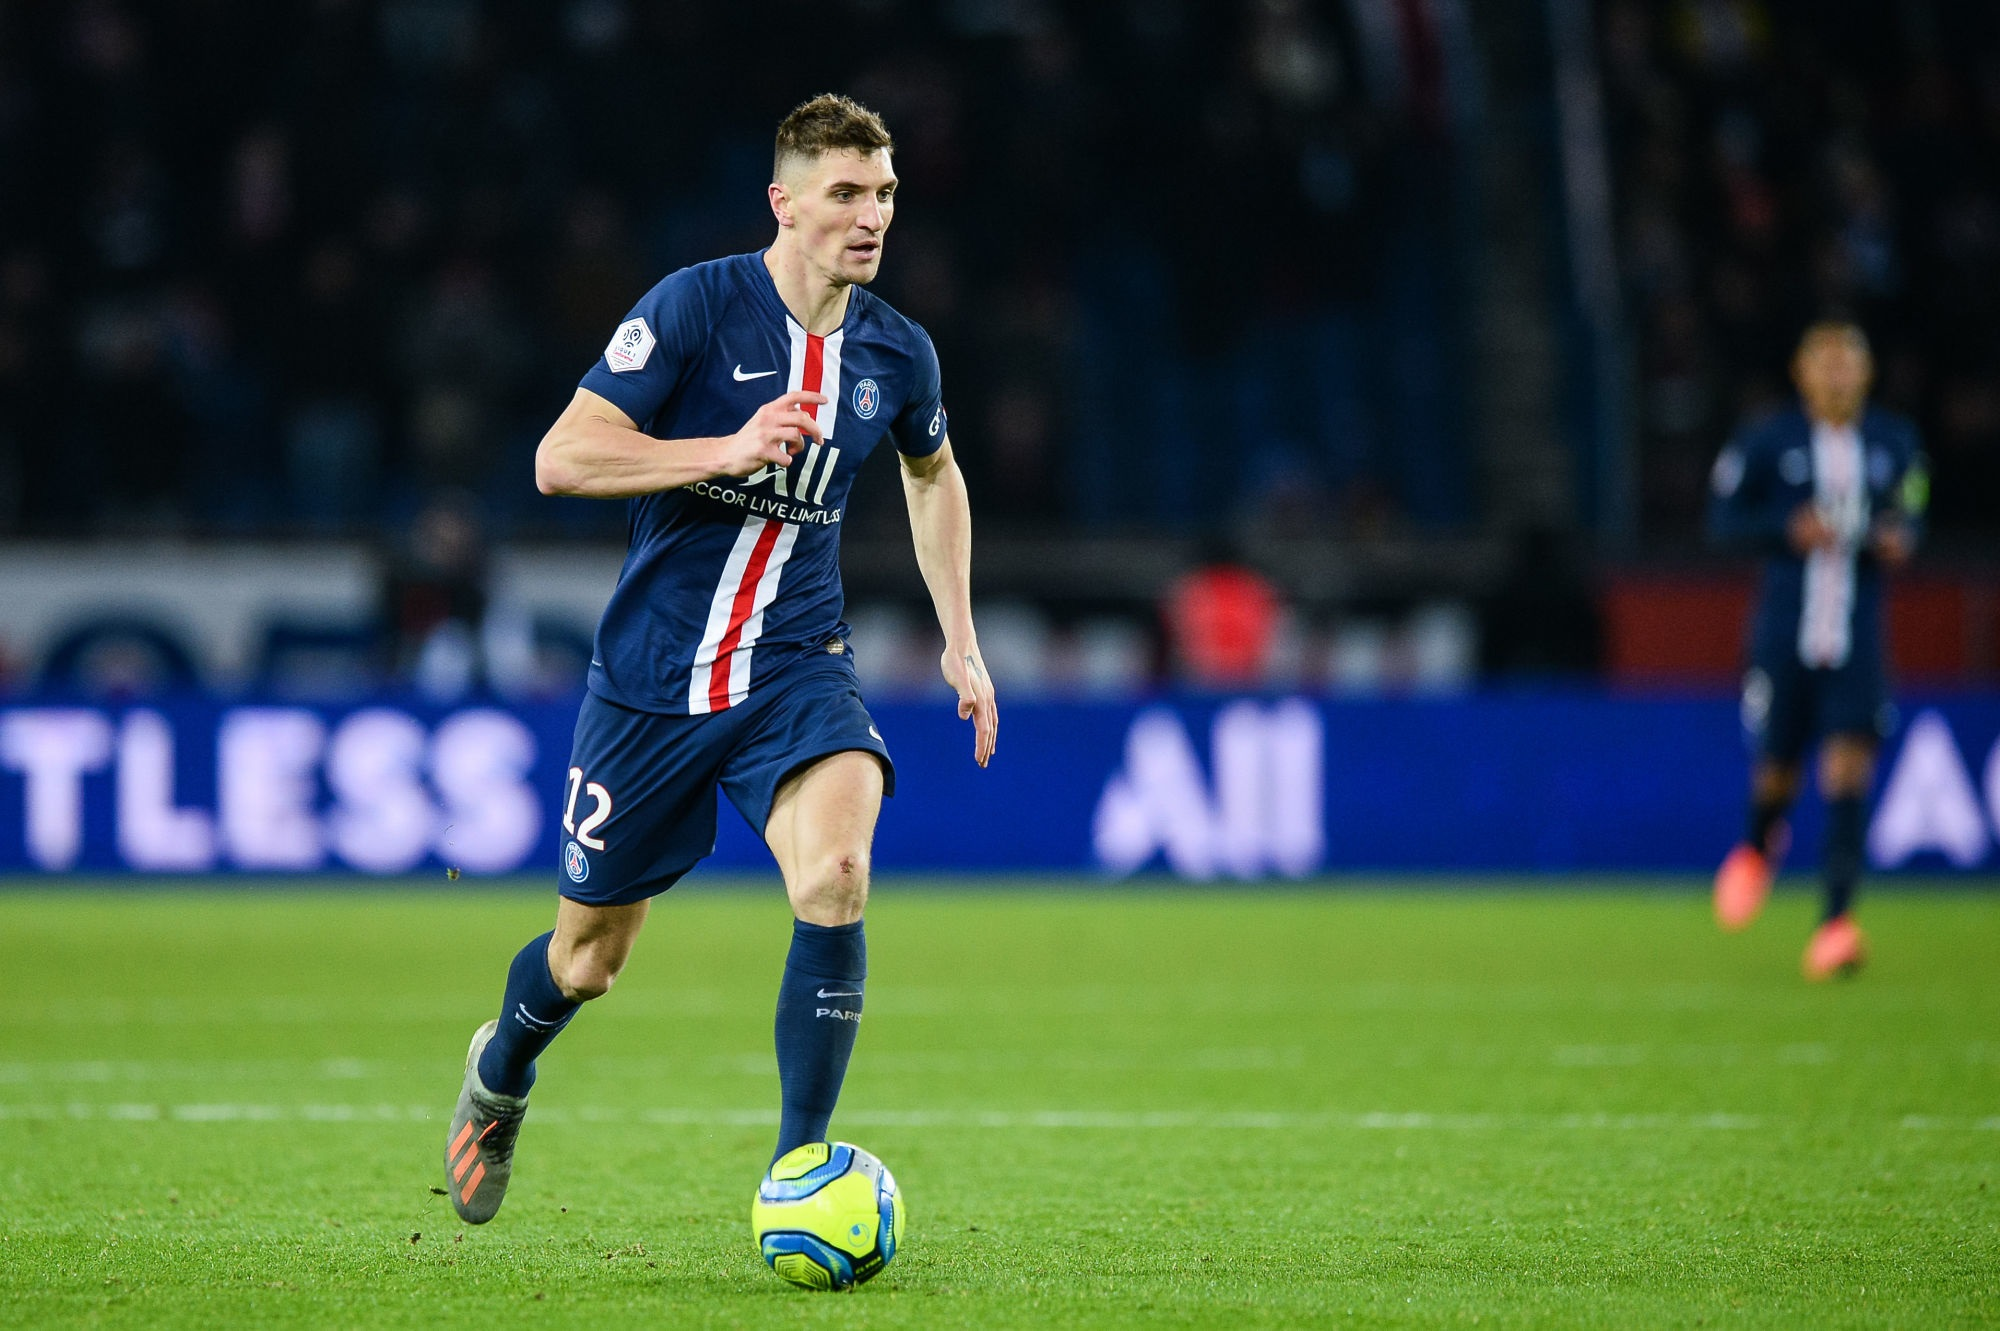 Mercato - Meunier a signé pour 4 saisons au Borussia Dortmund, confirme Bild